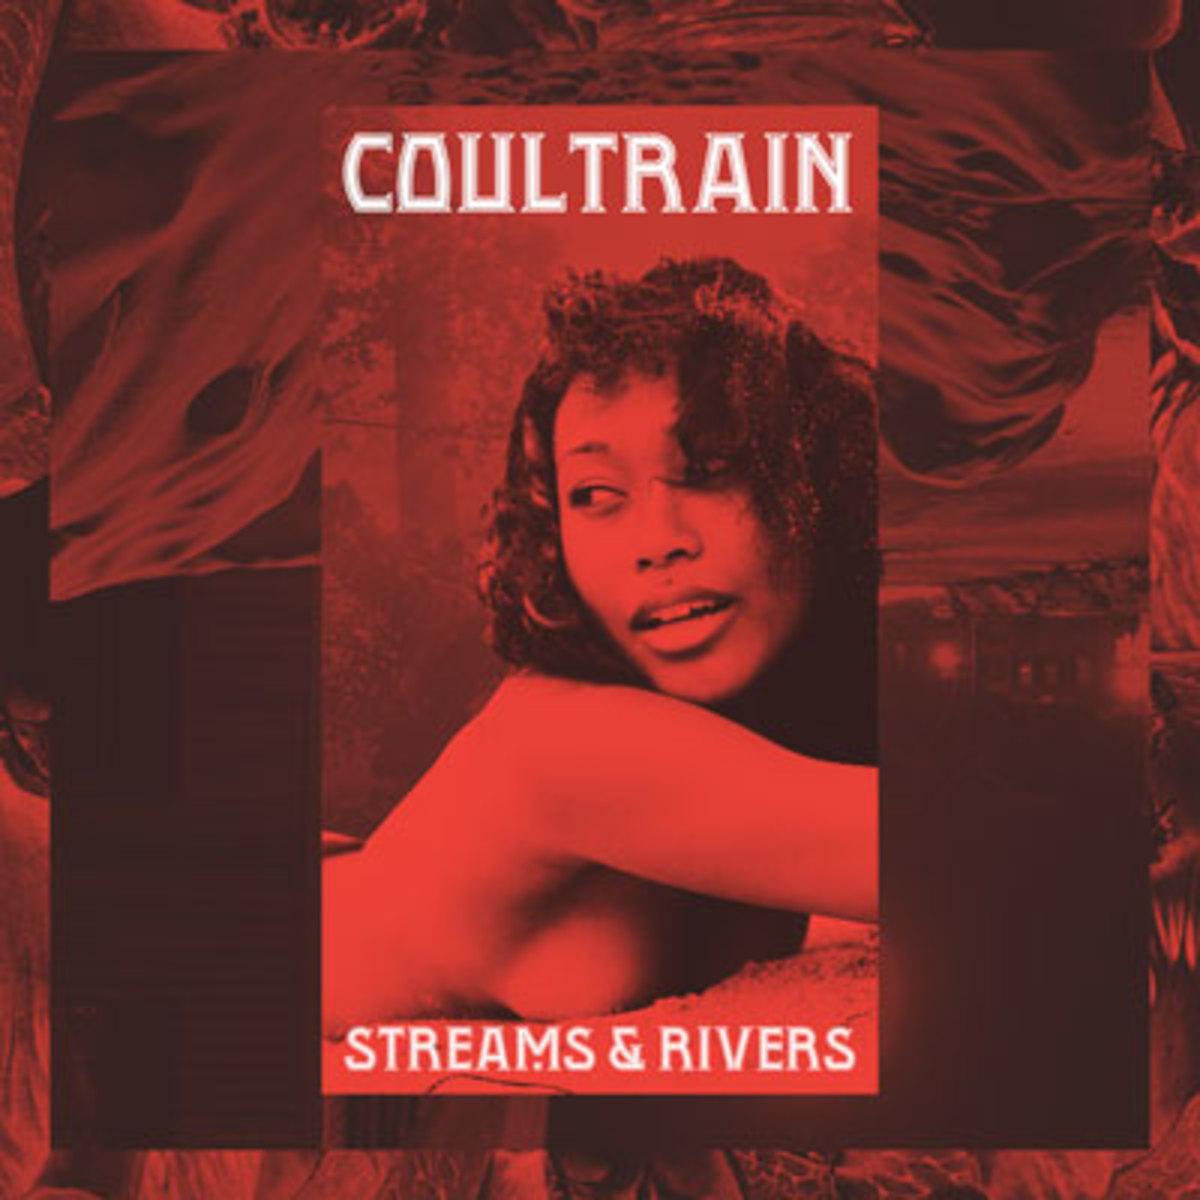 coultrain-streamsandrivers.jpg